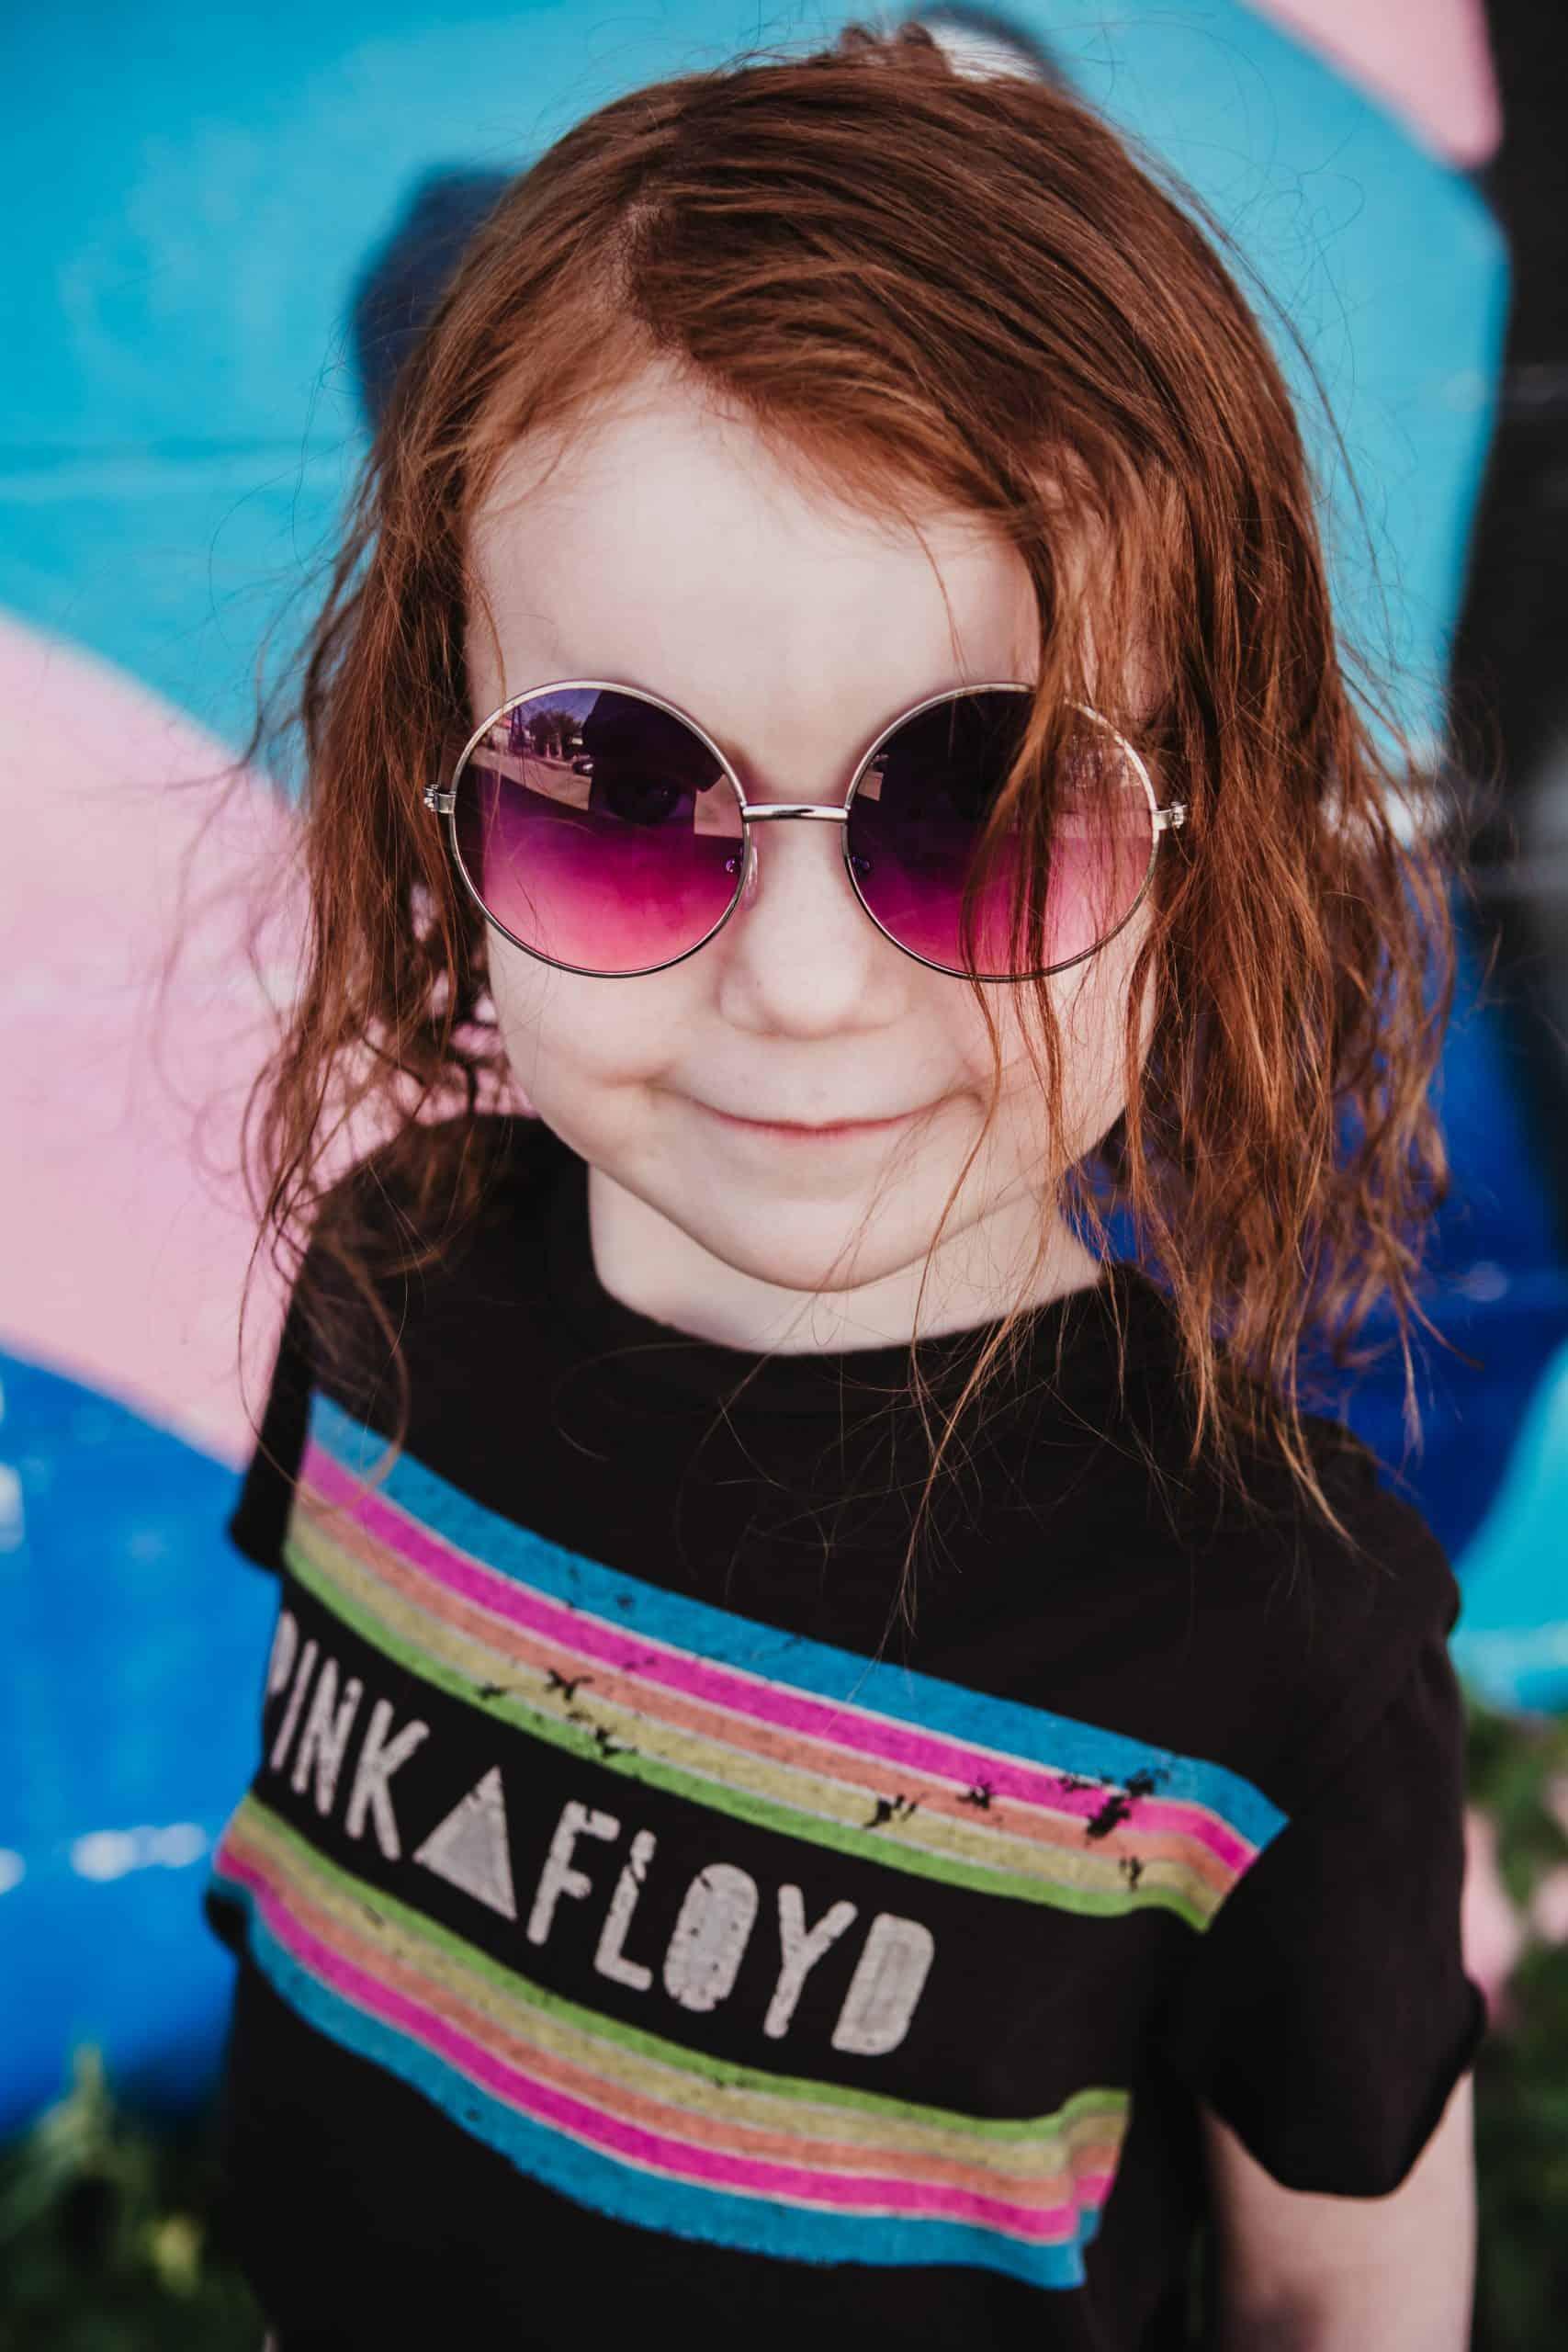 Bigger Beats Edmonton, With Elodie in Sunglasses